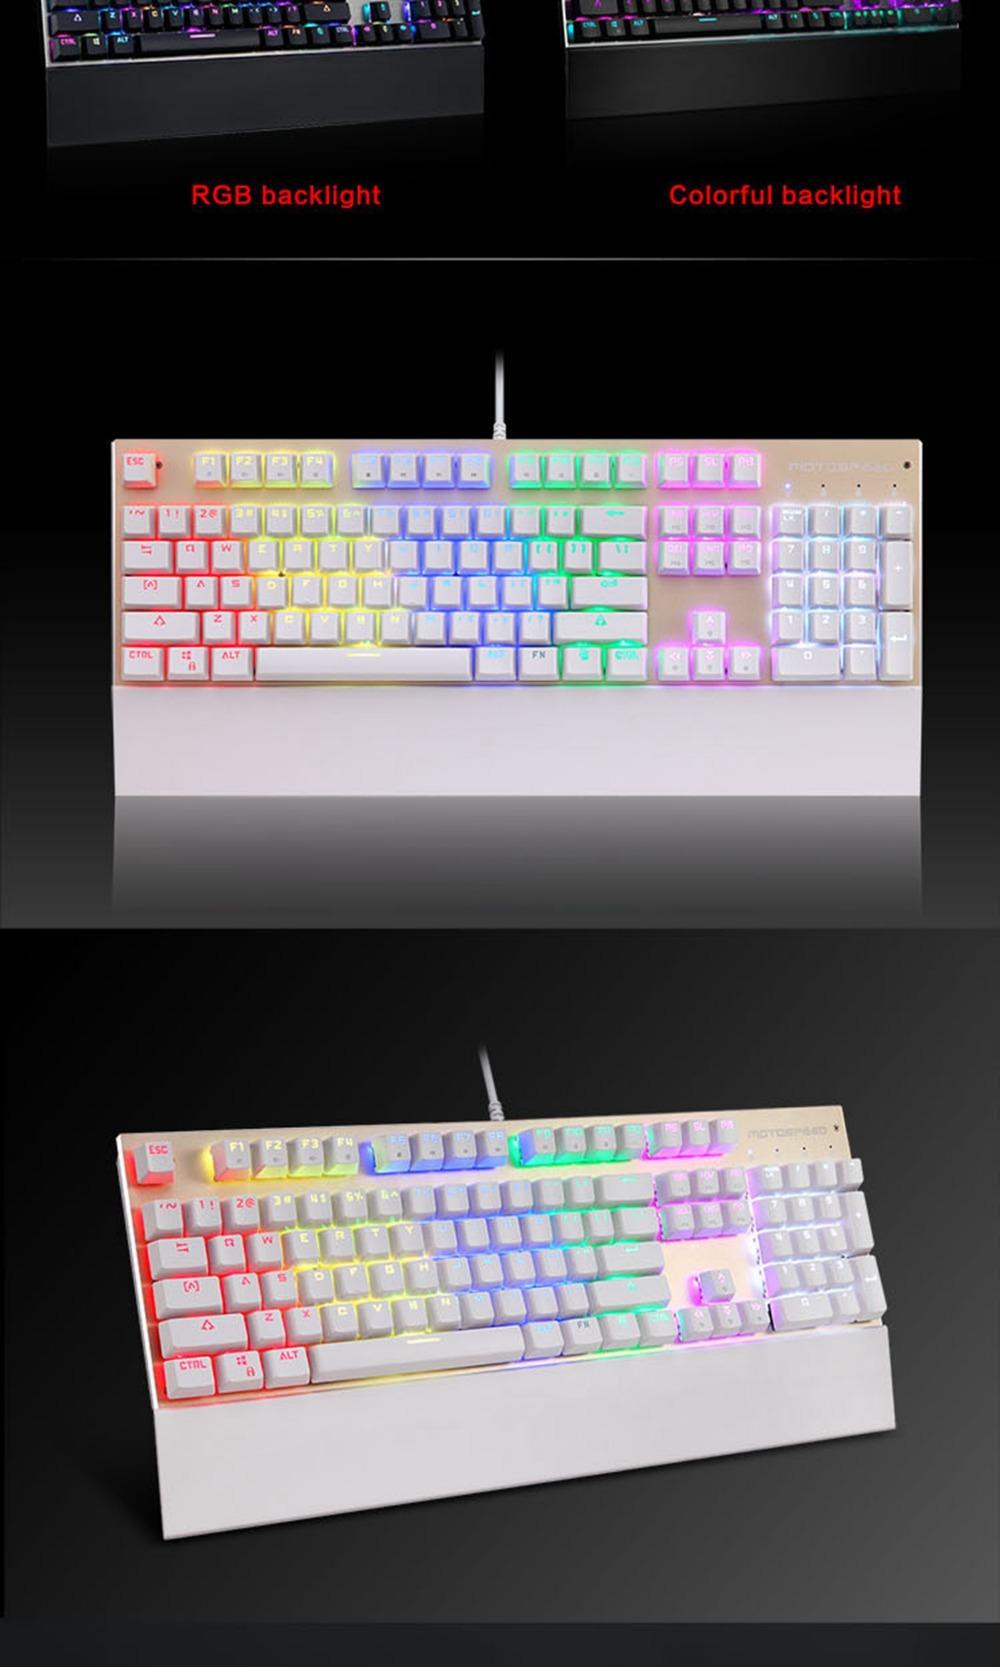 CK108 Mechanical Gaming Keyboard RGB - COCOLMALL DEAL